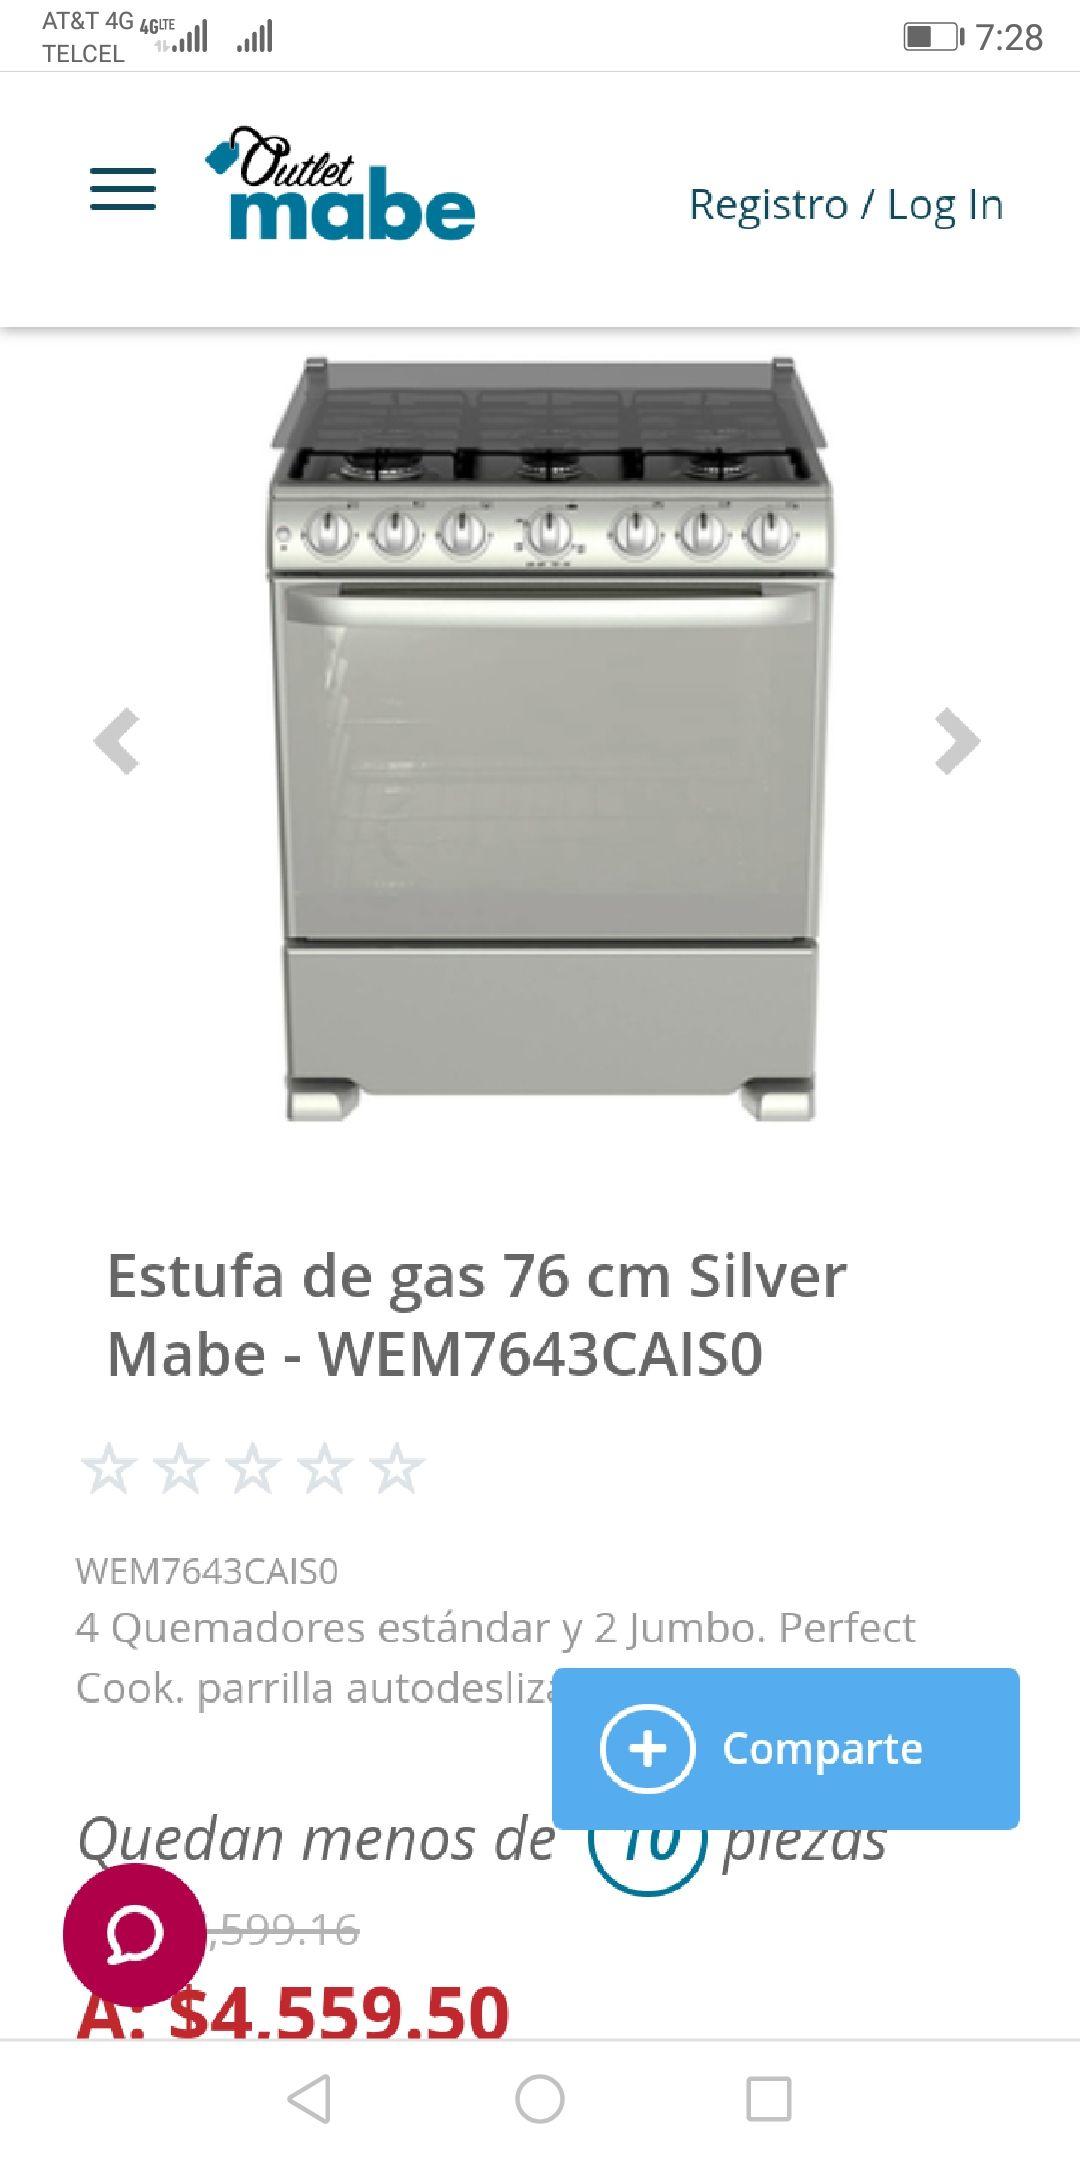 Outlet Mabe : estufa gas 76 cm Silver 6 quemadores WEM7643CAIS0